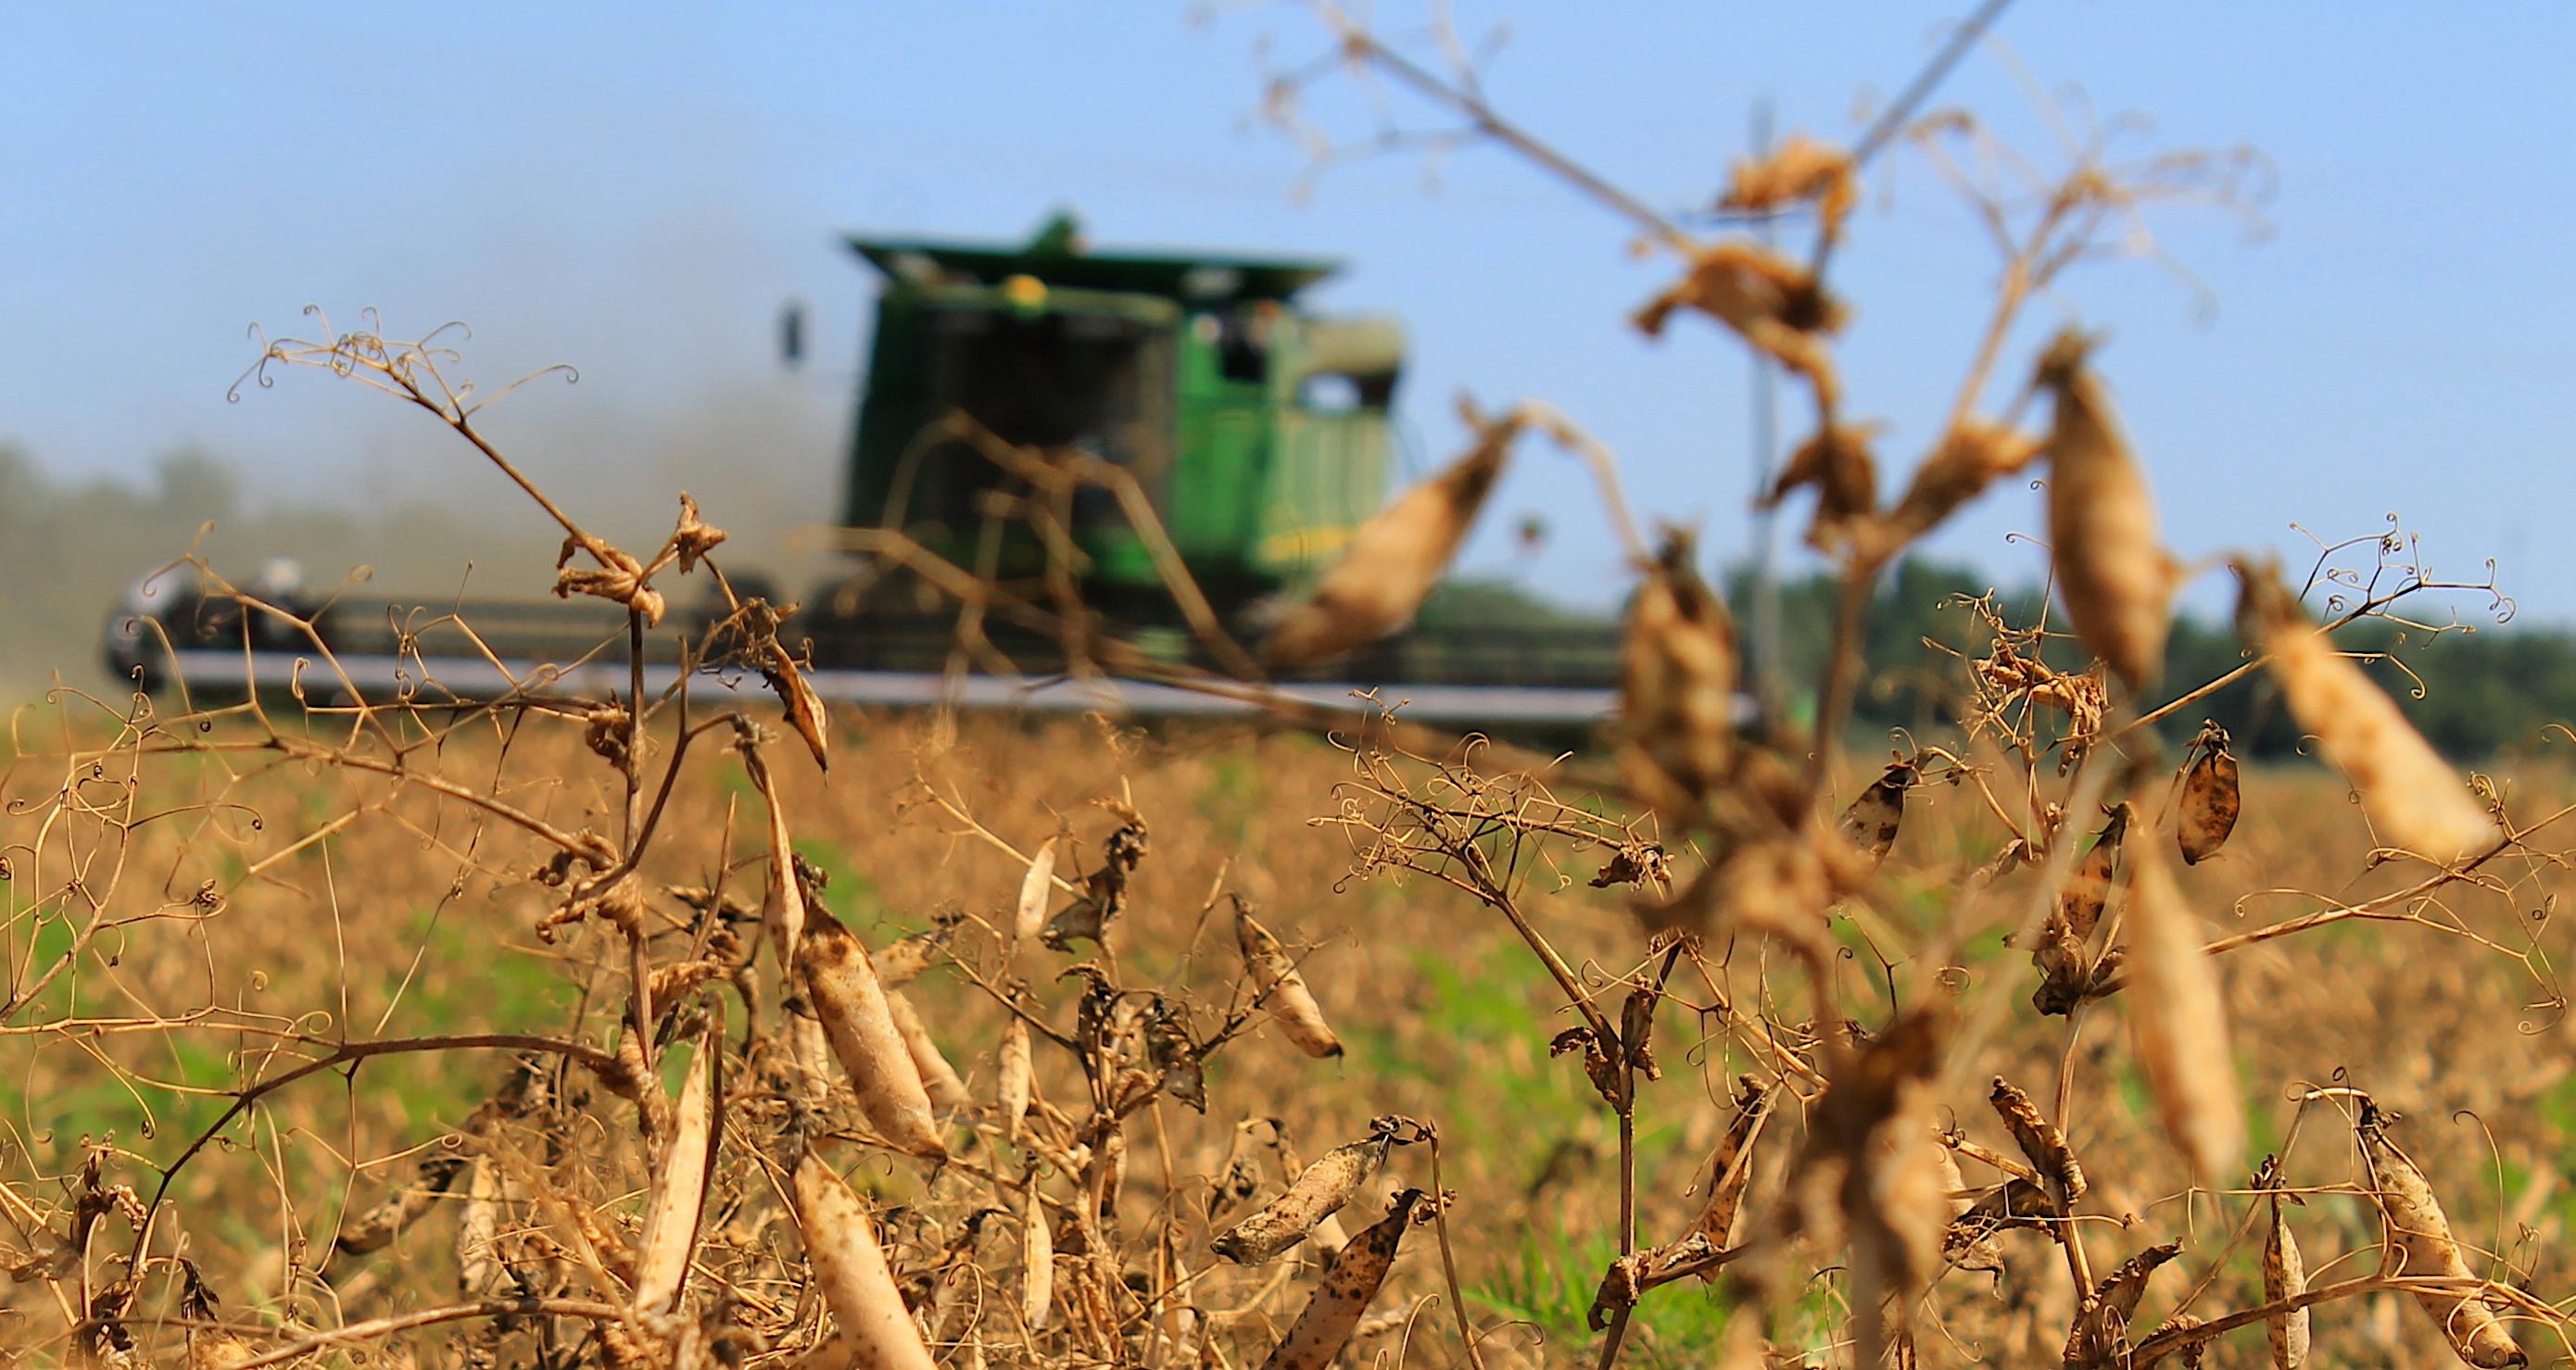 CWF harvesting organic field peas!